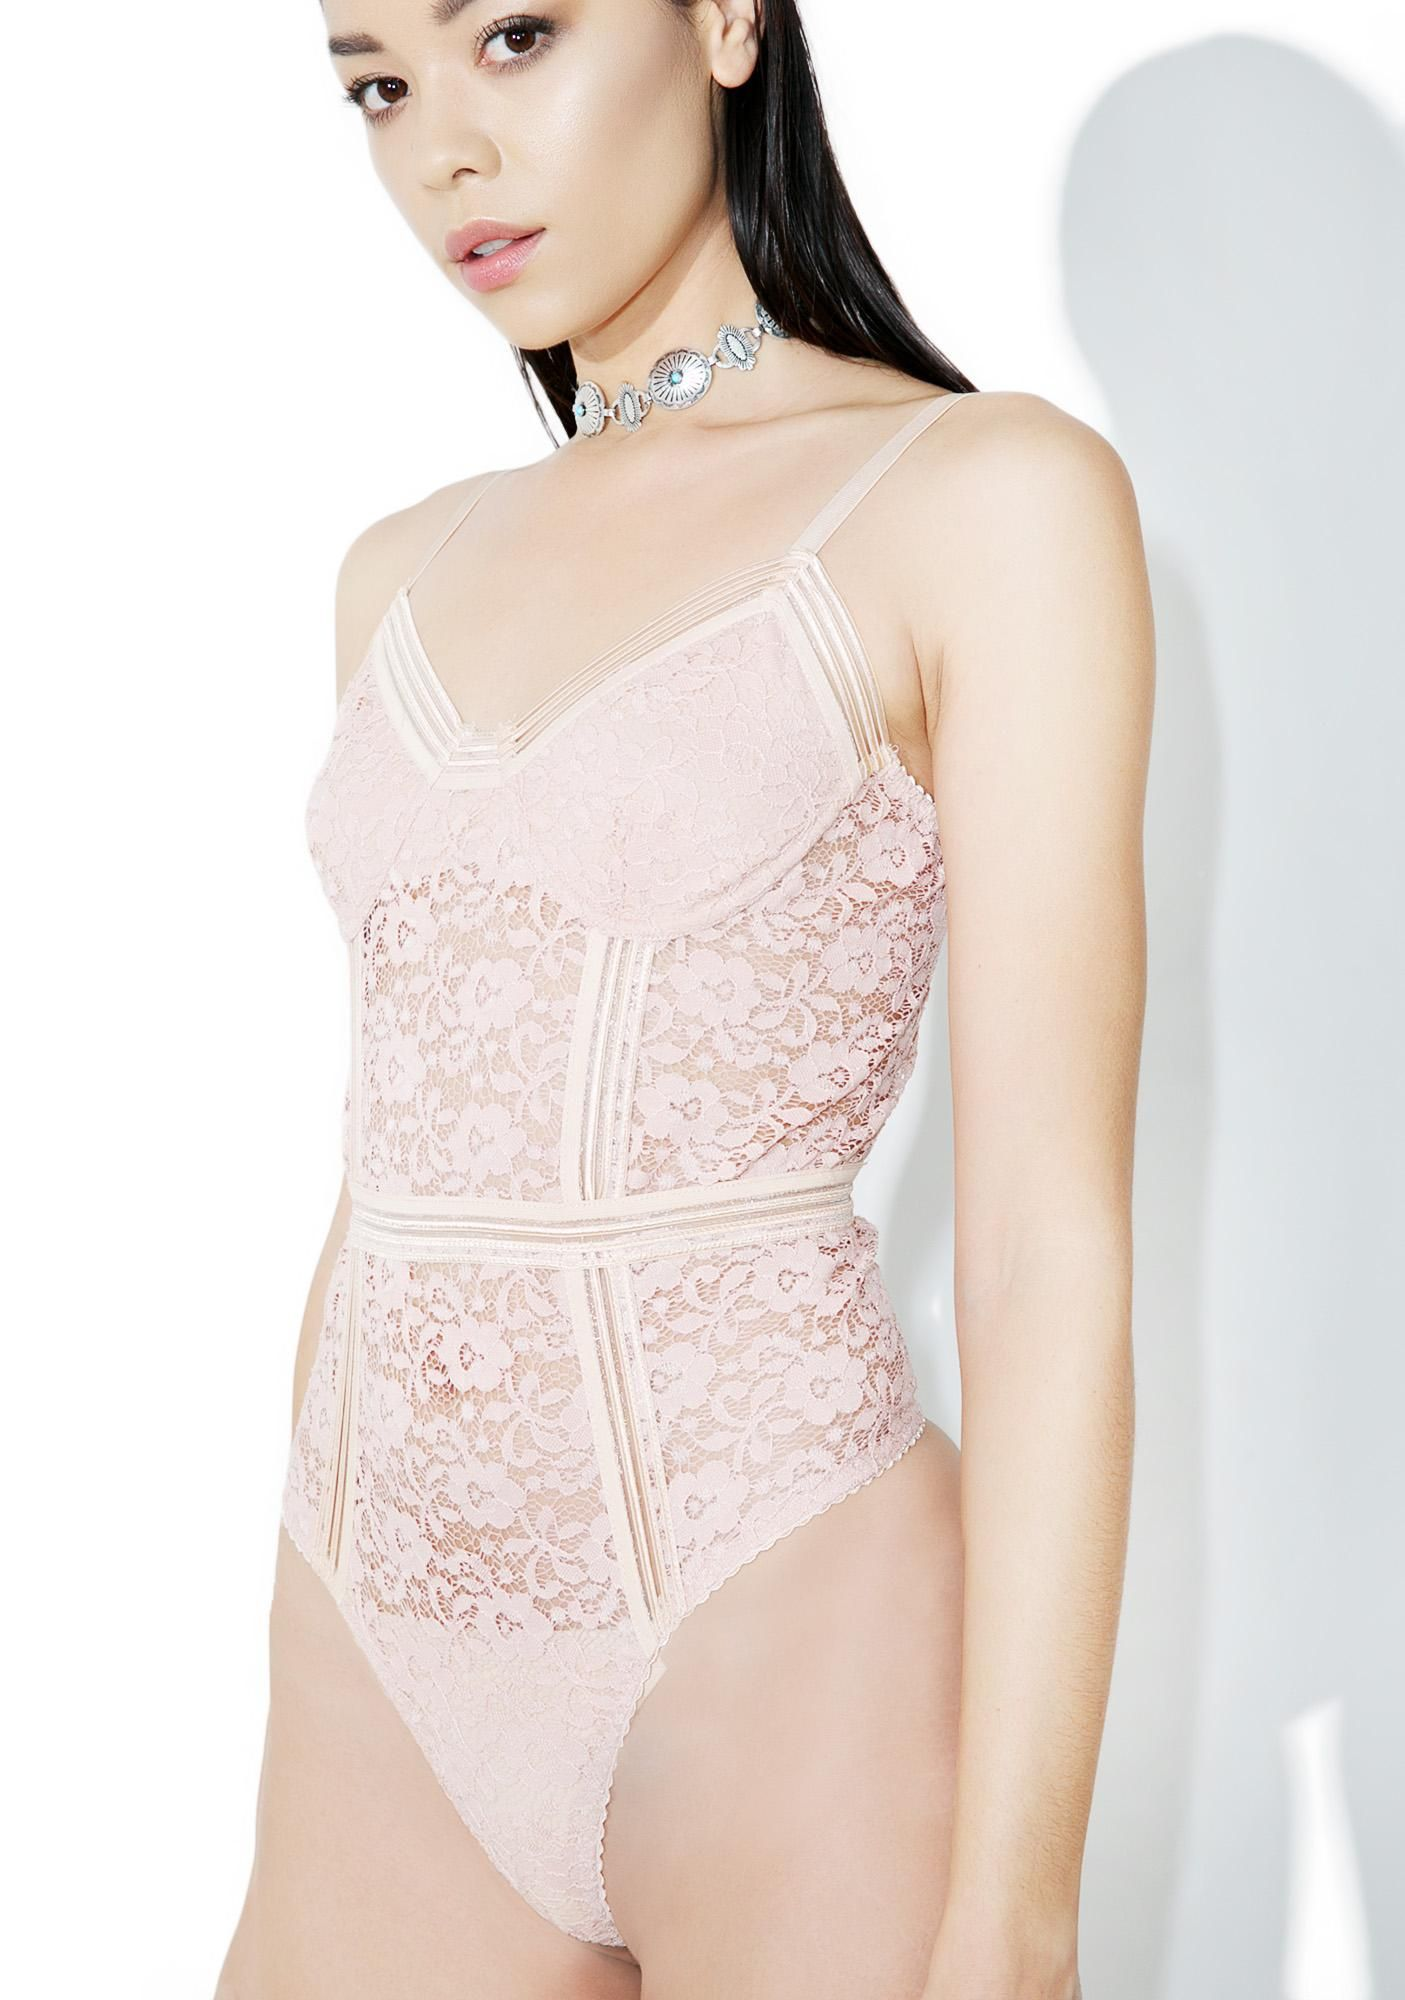 53ac991b43 Halation Lace Bodysuit is gunna treat ya sweet  N gentle